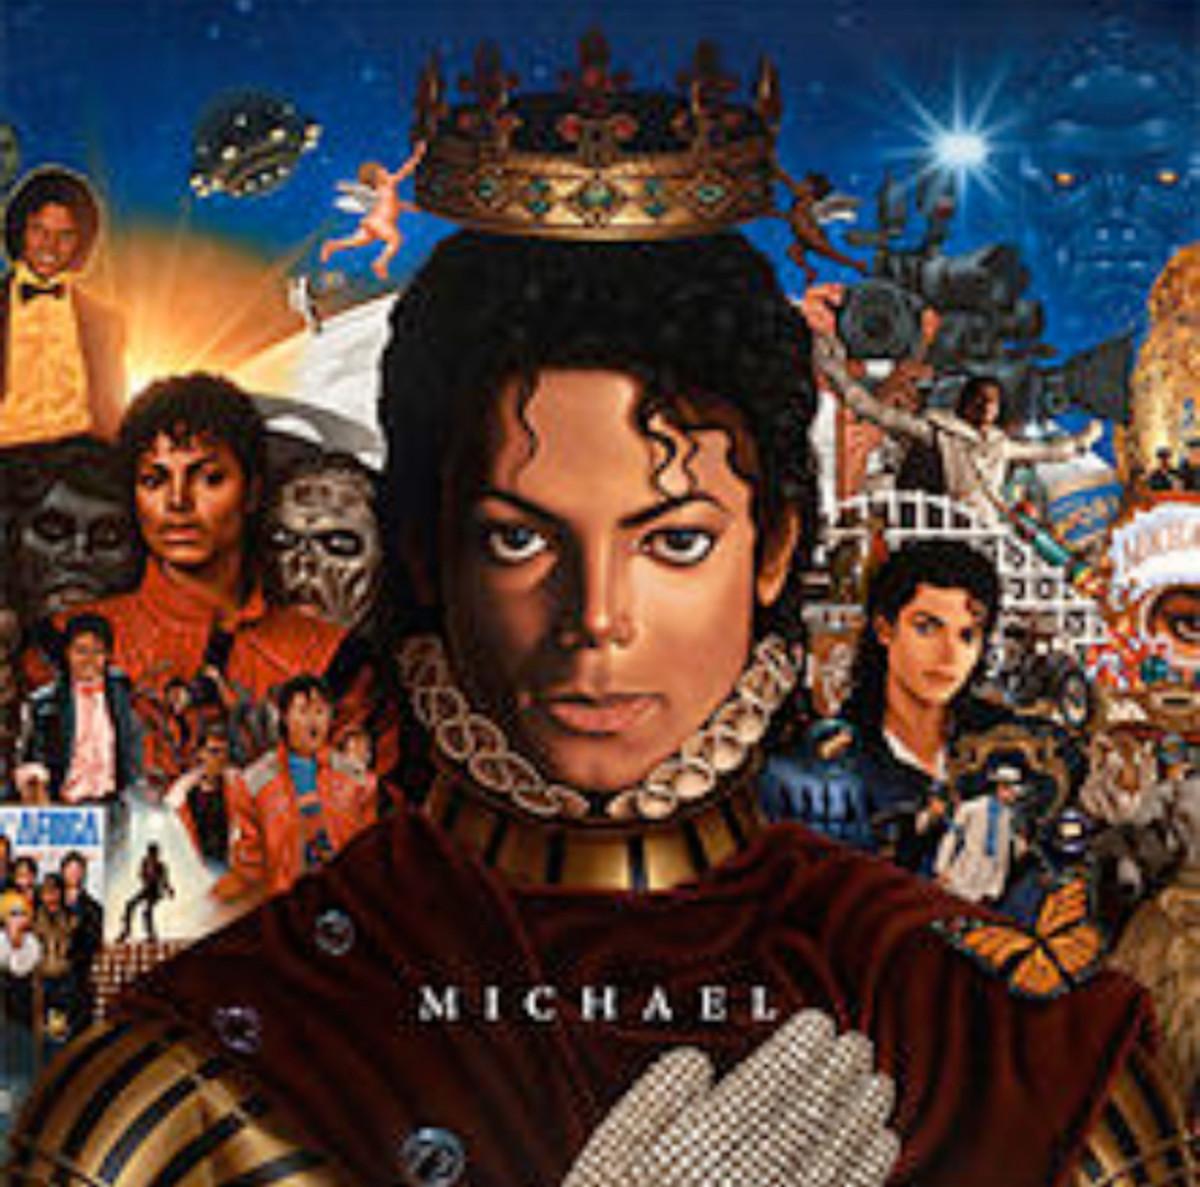 Michael Album Cover. Photo: Sony Music.